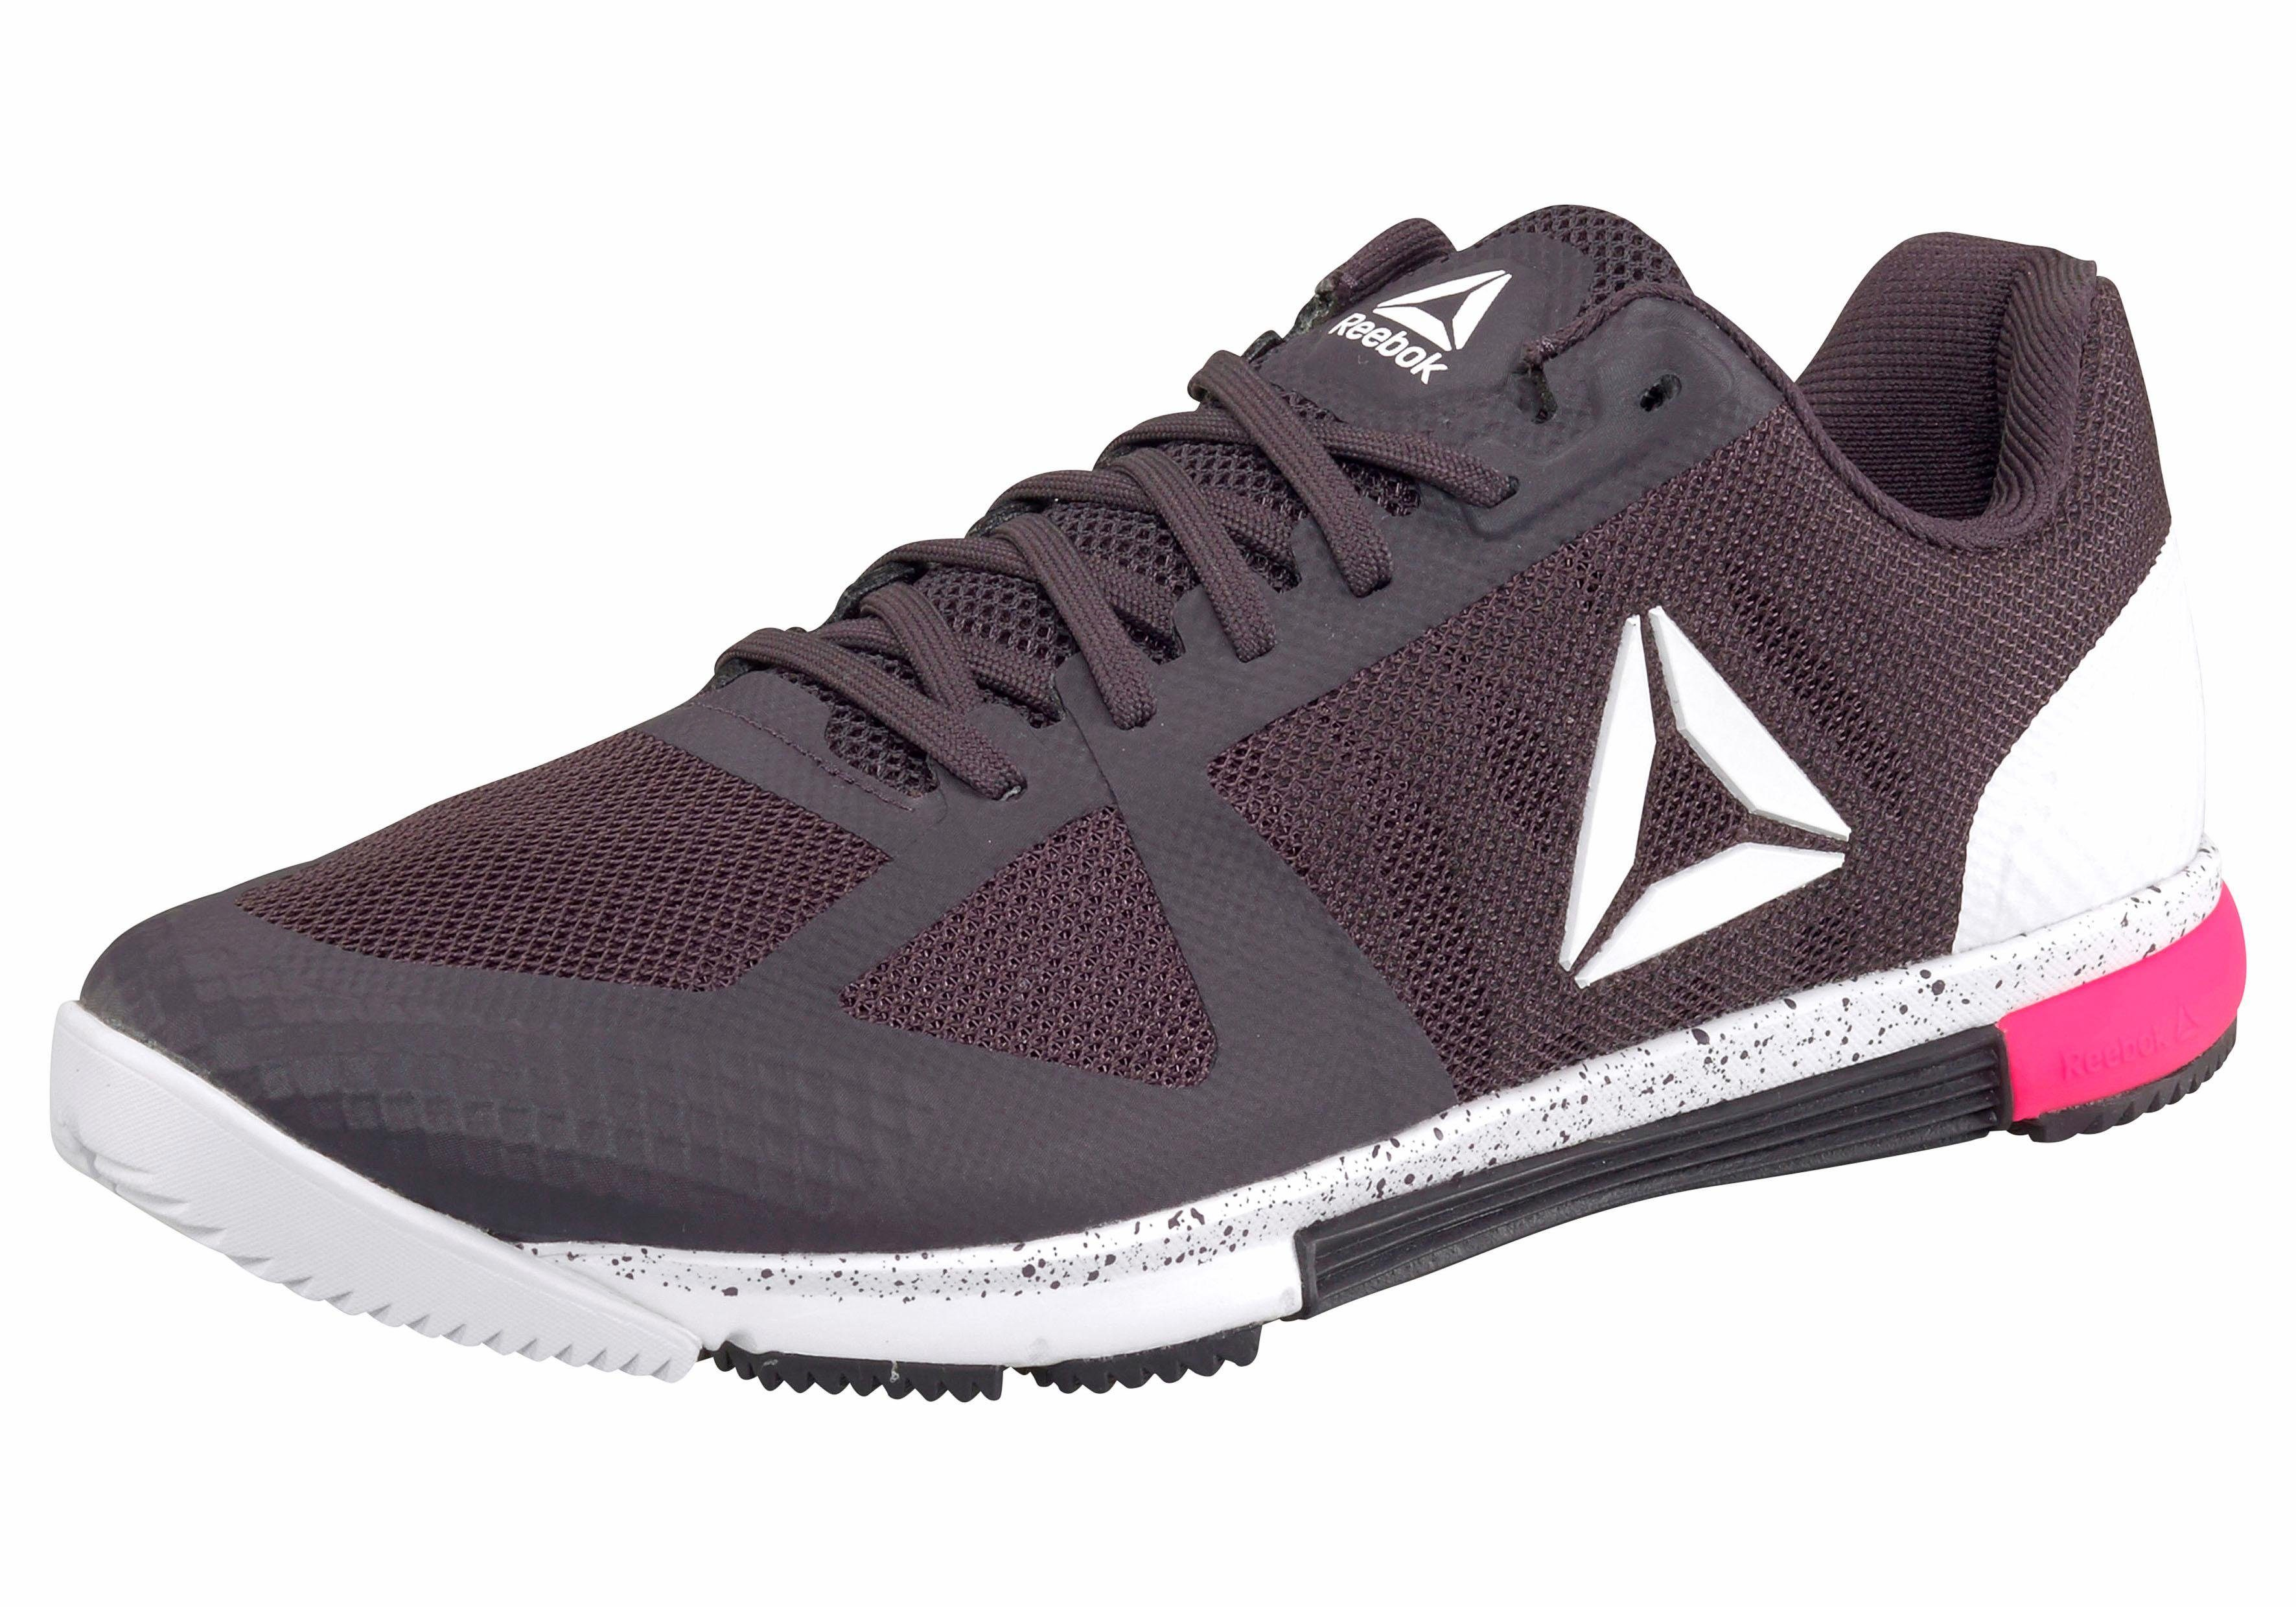 Reebok - Chaussures De Formation Crossfit Vitesse Tr - Hommes - Chaussures - Noir - 43 0Z6NtjV3G